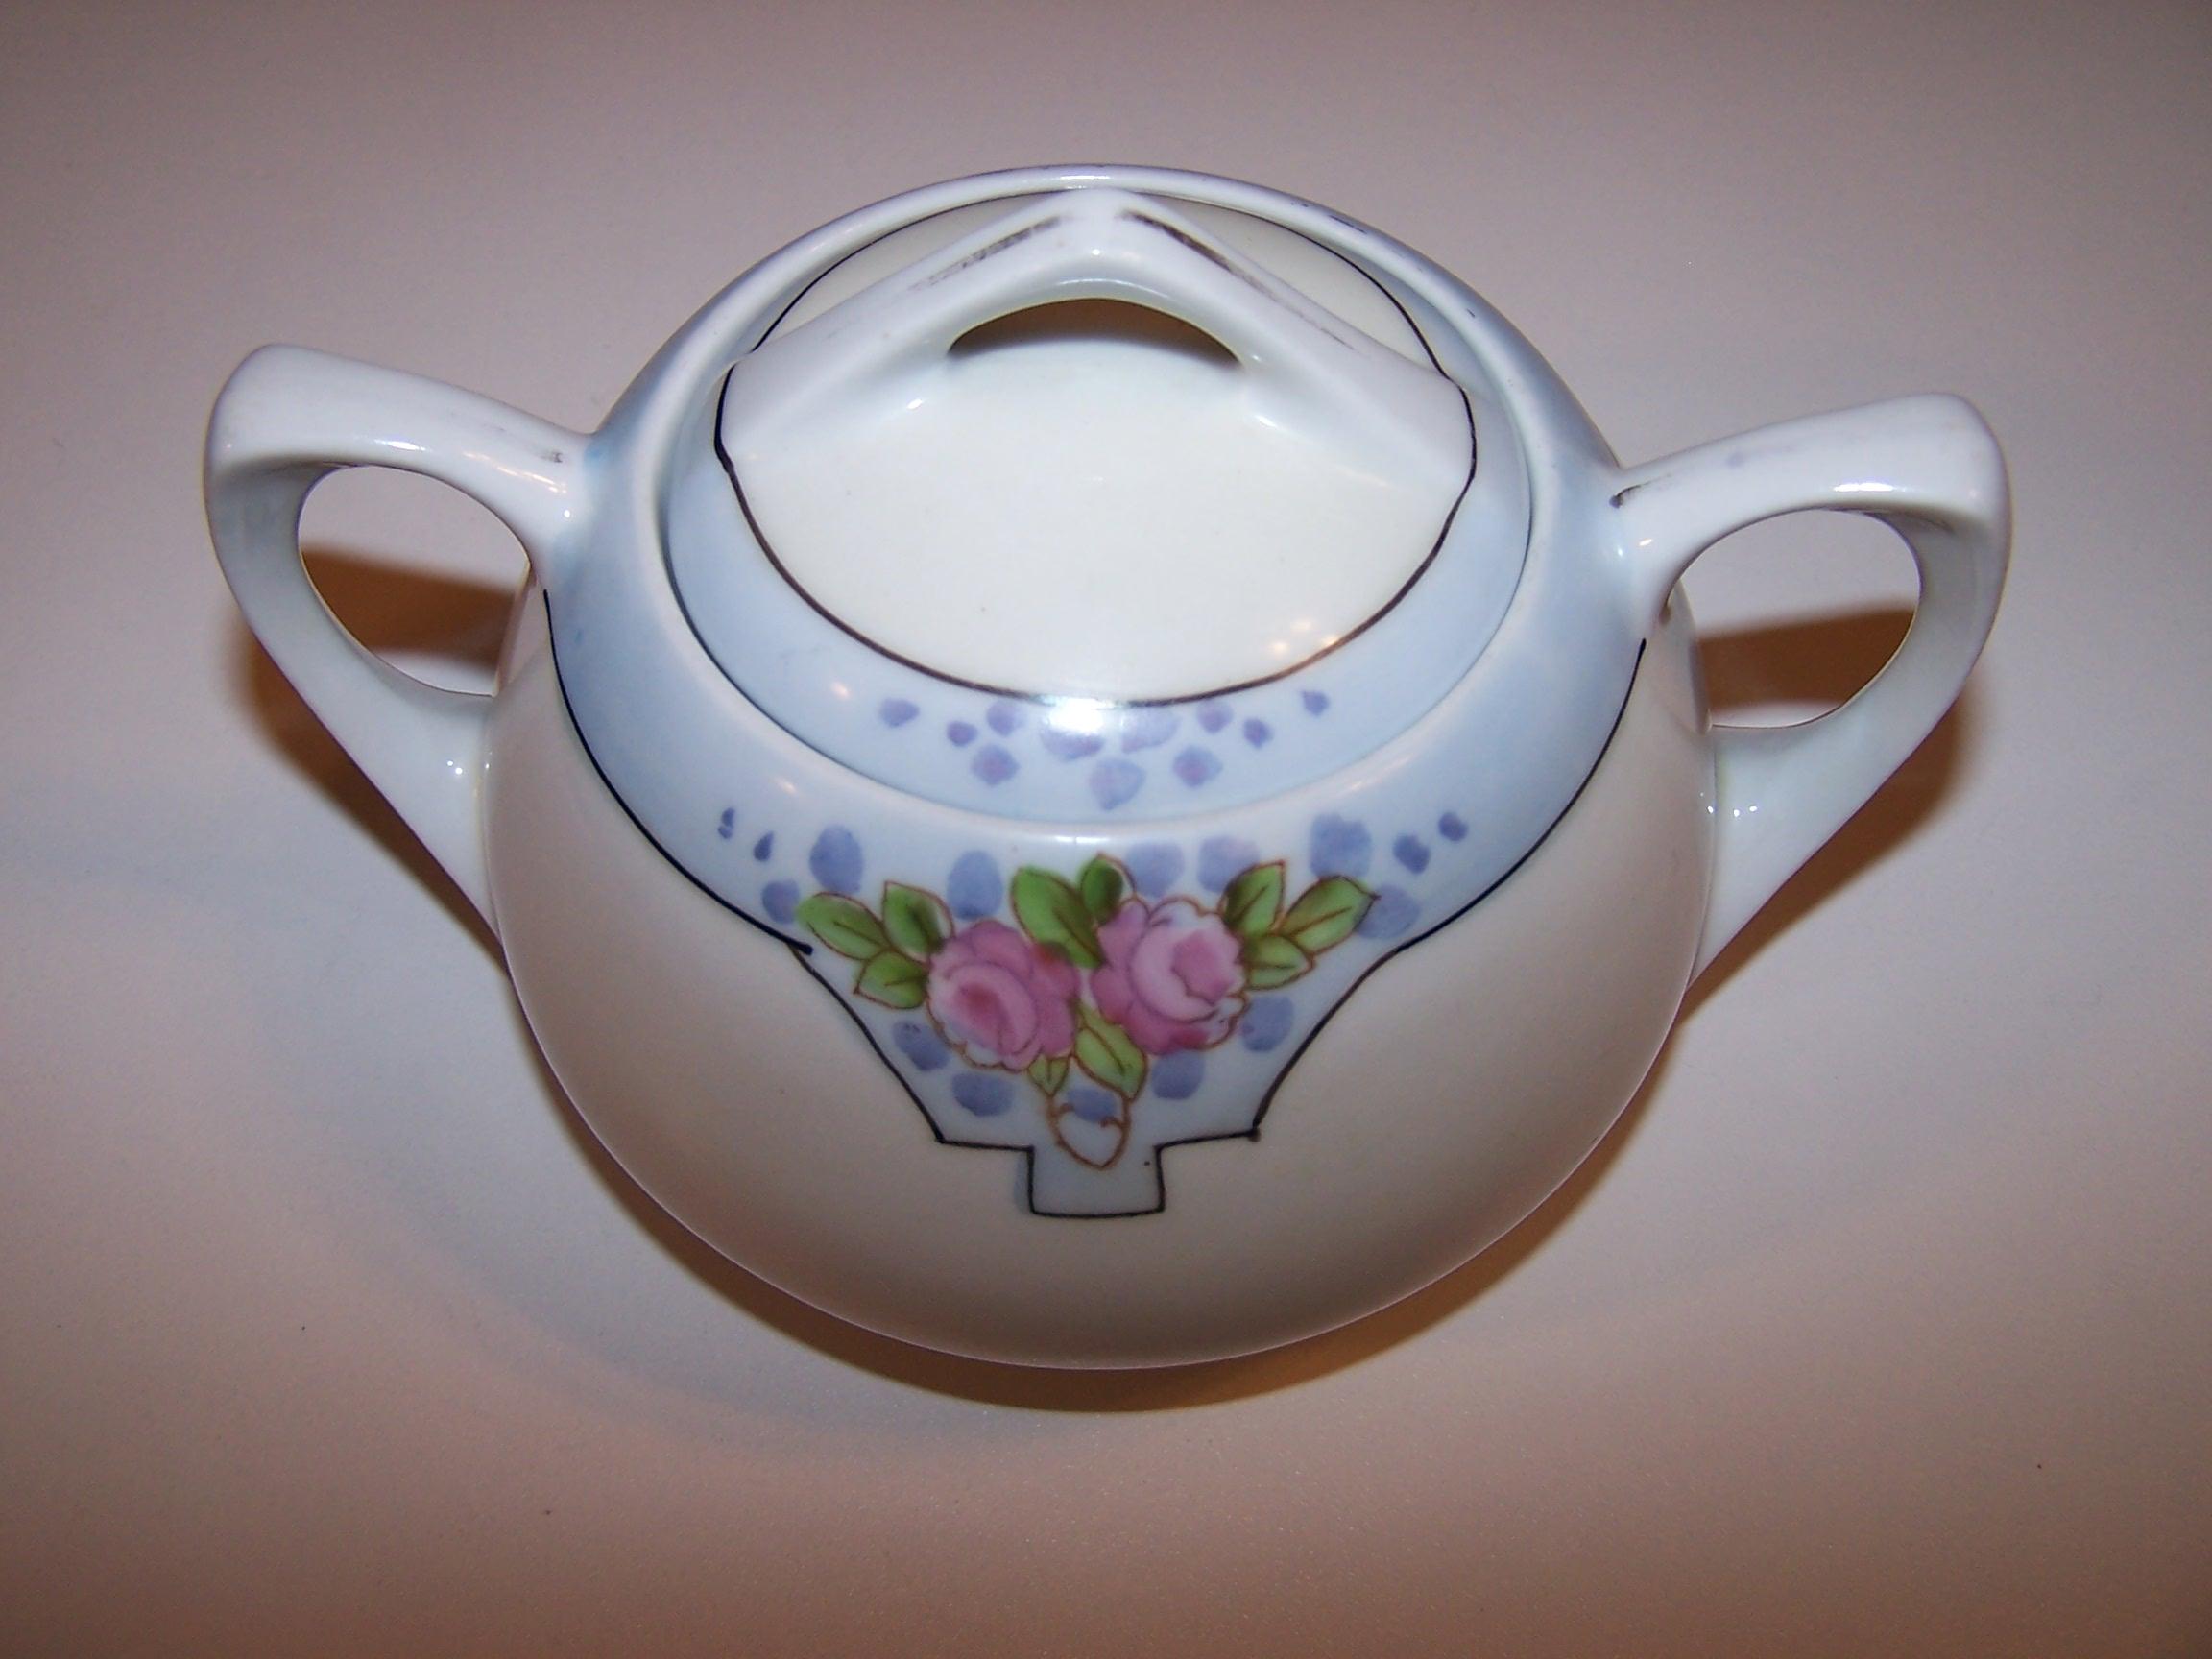 Meito China Sugar Bowl, Pink Roses w Blue Spots